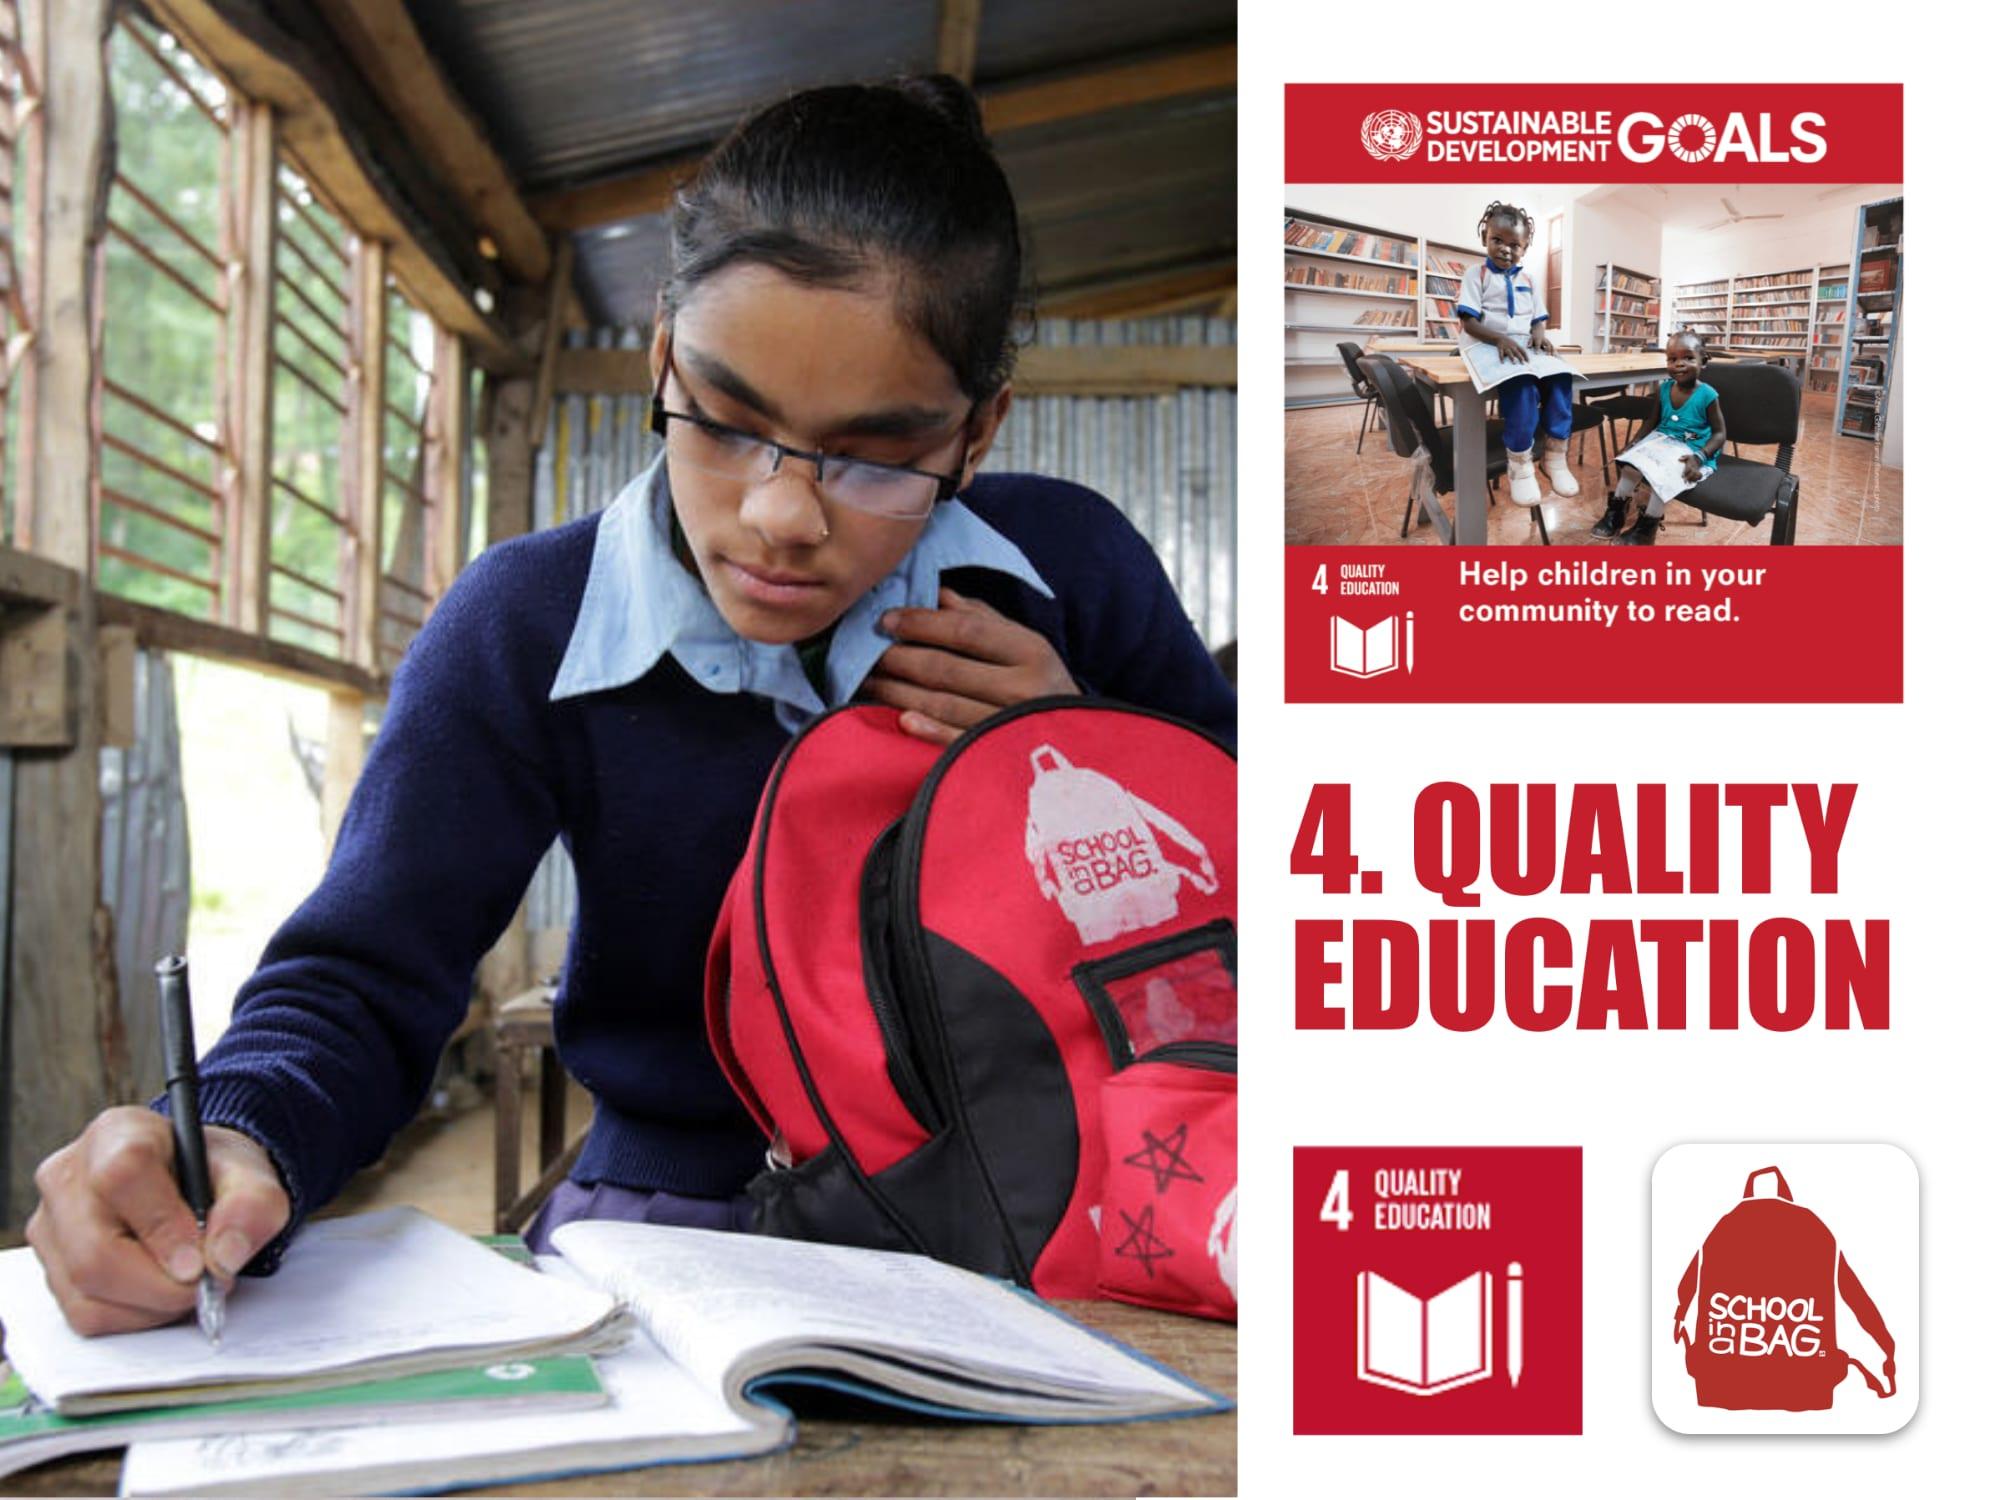 SDG Quality Education